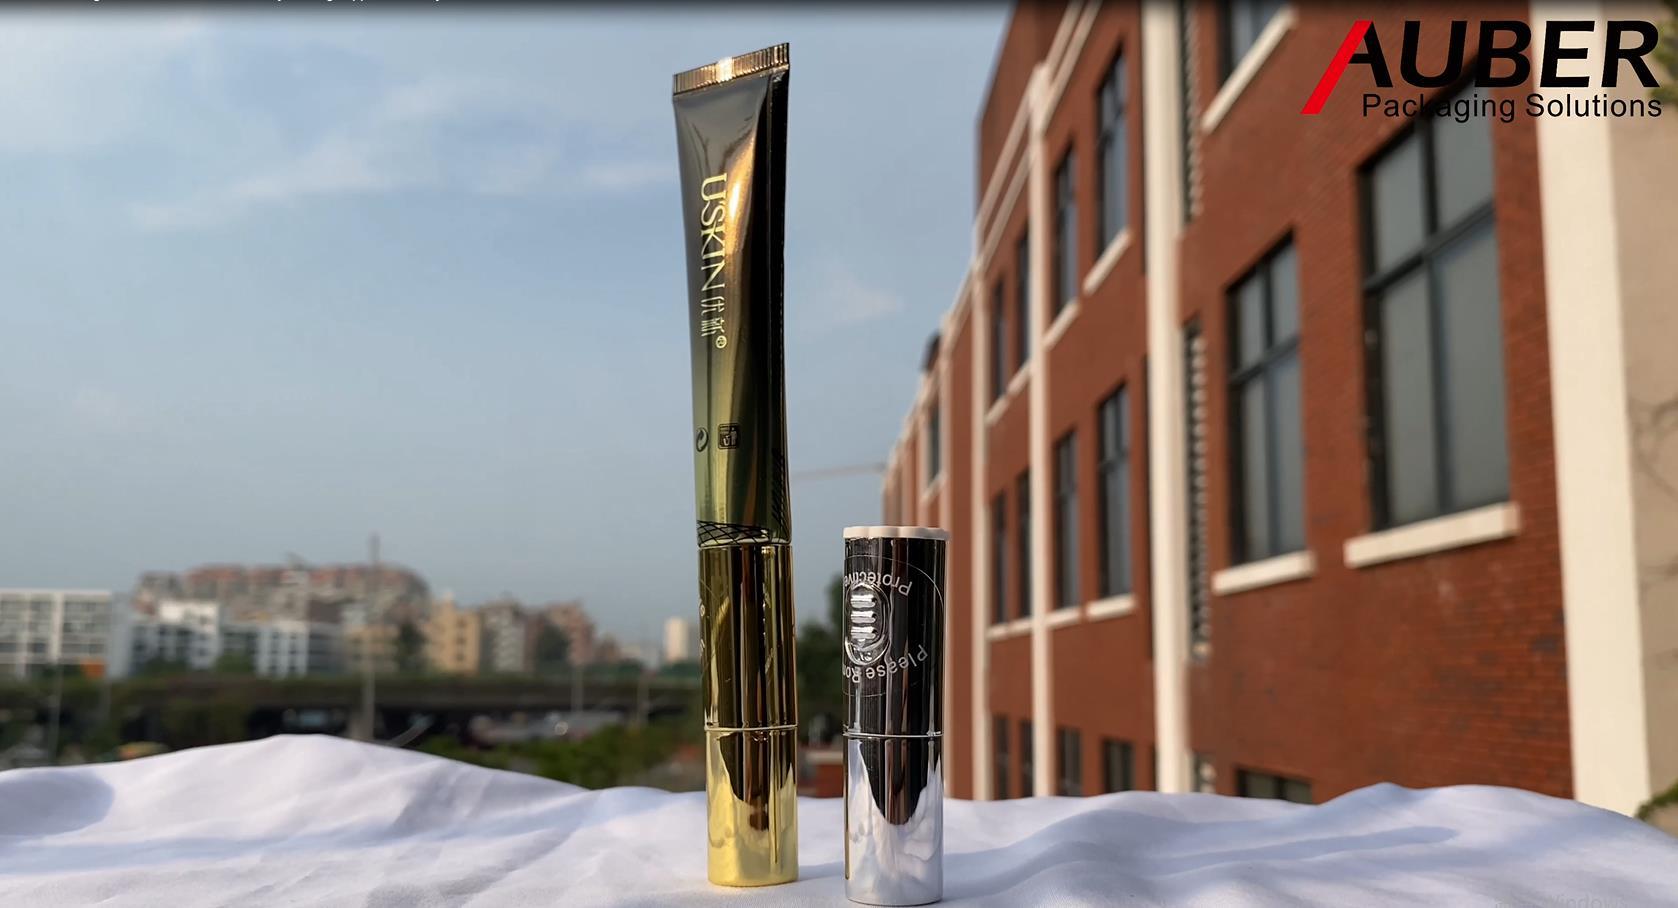 Auber D19mm عالية لامعة طلاء الألومنيوم أنبوب مغلفة مع قضيب تدليك سبائك الزنك لجوهر العين